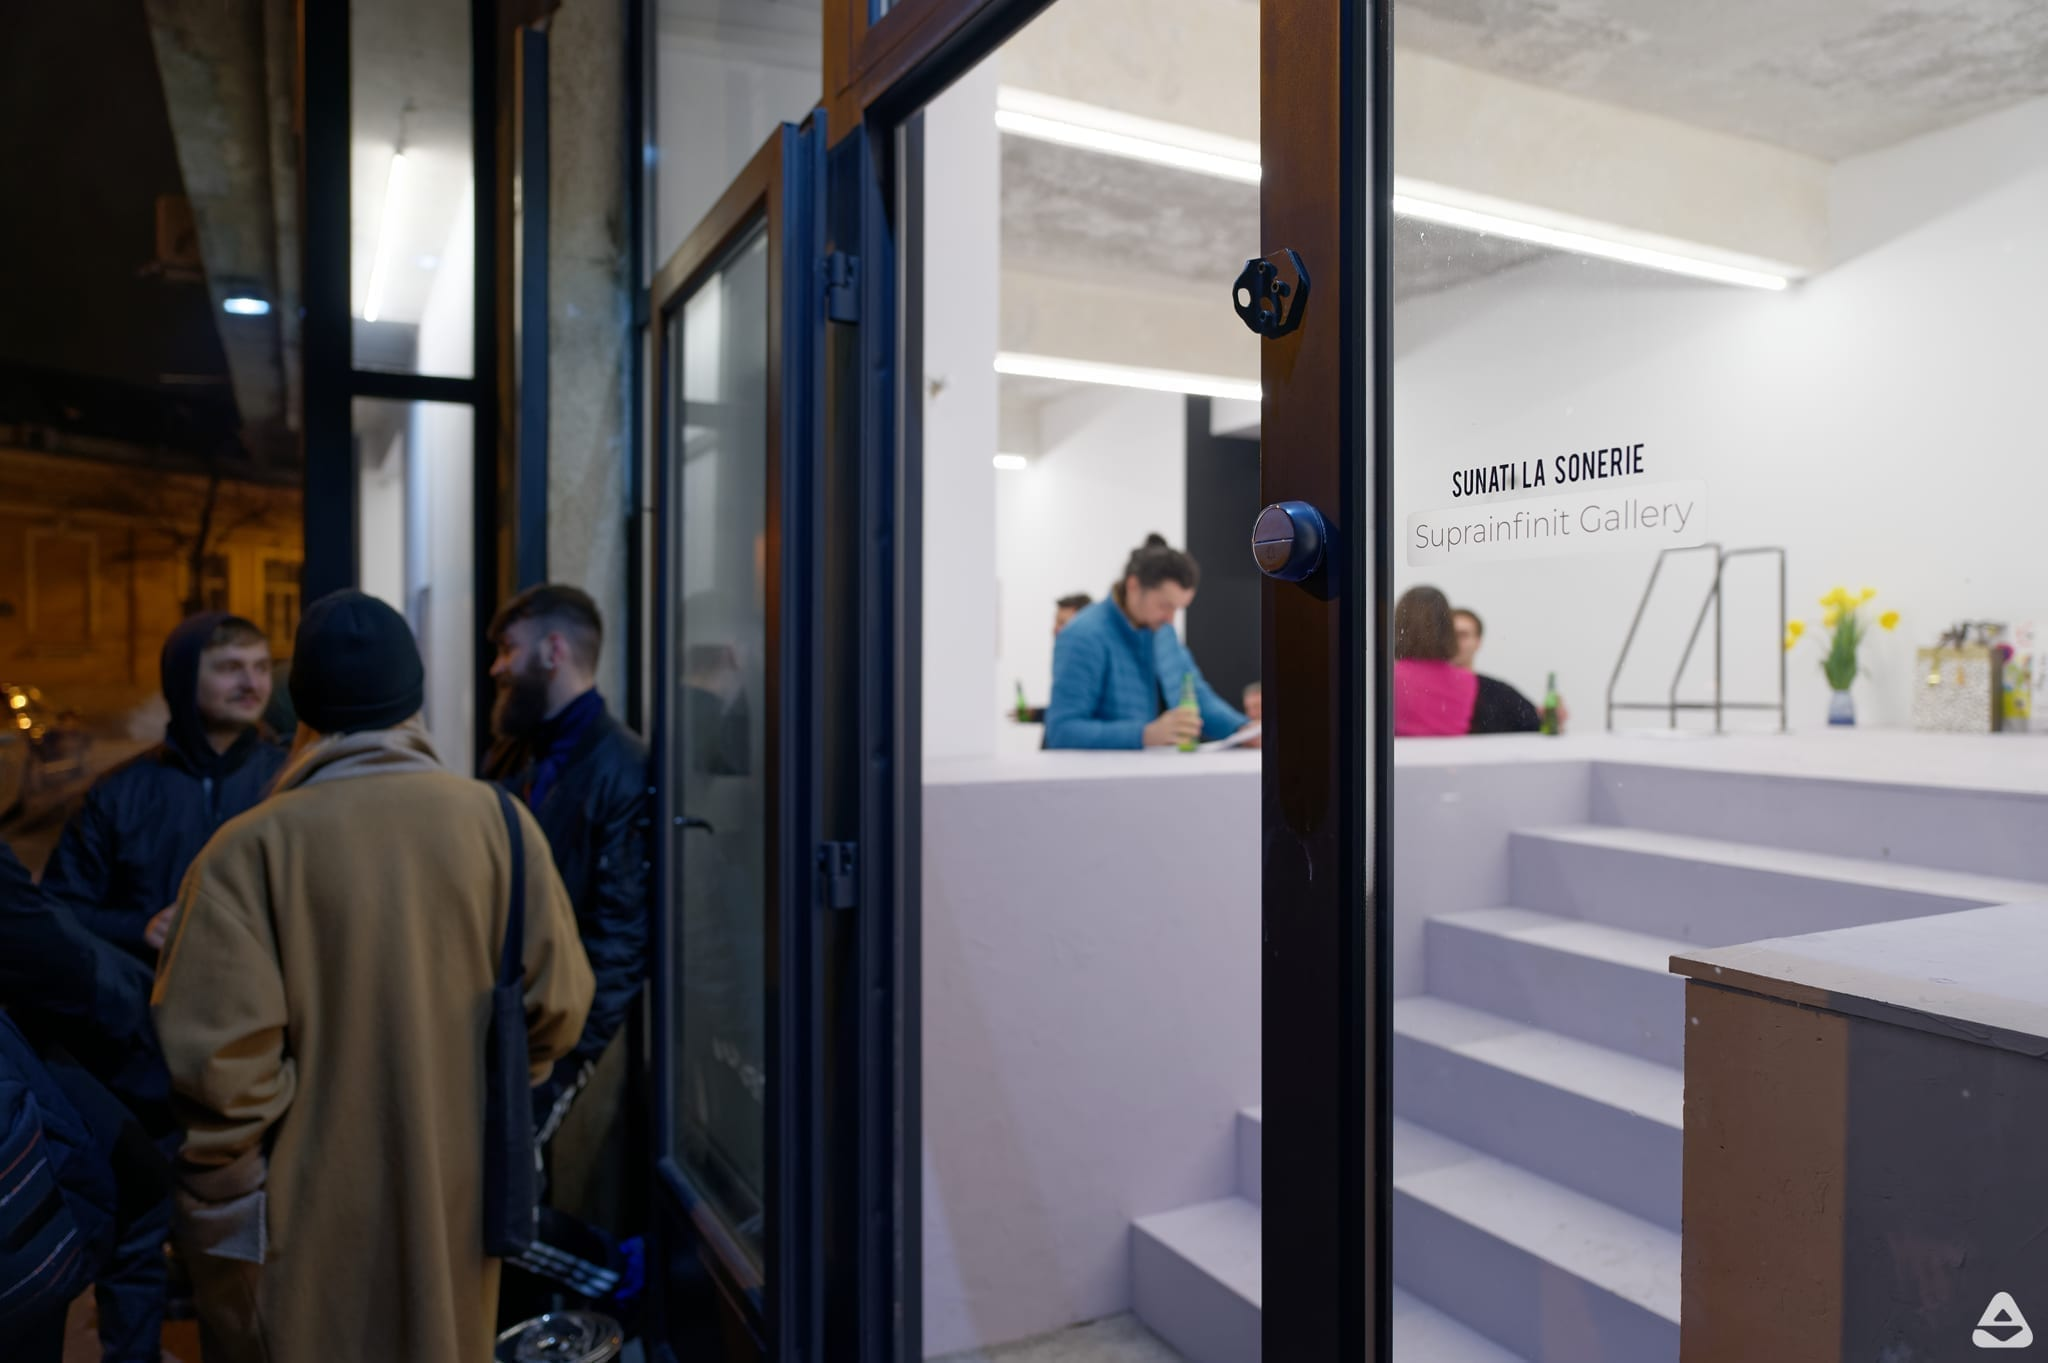 Suprainfinit Gallery - intrare